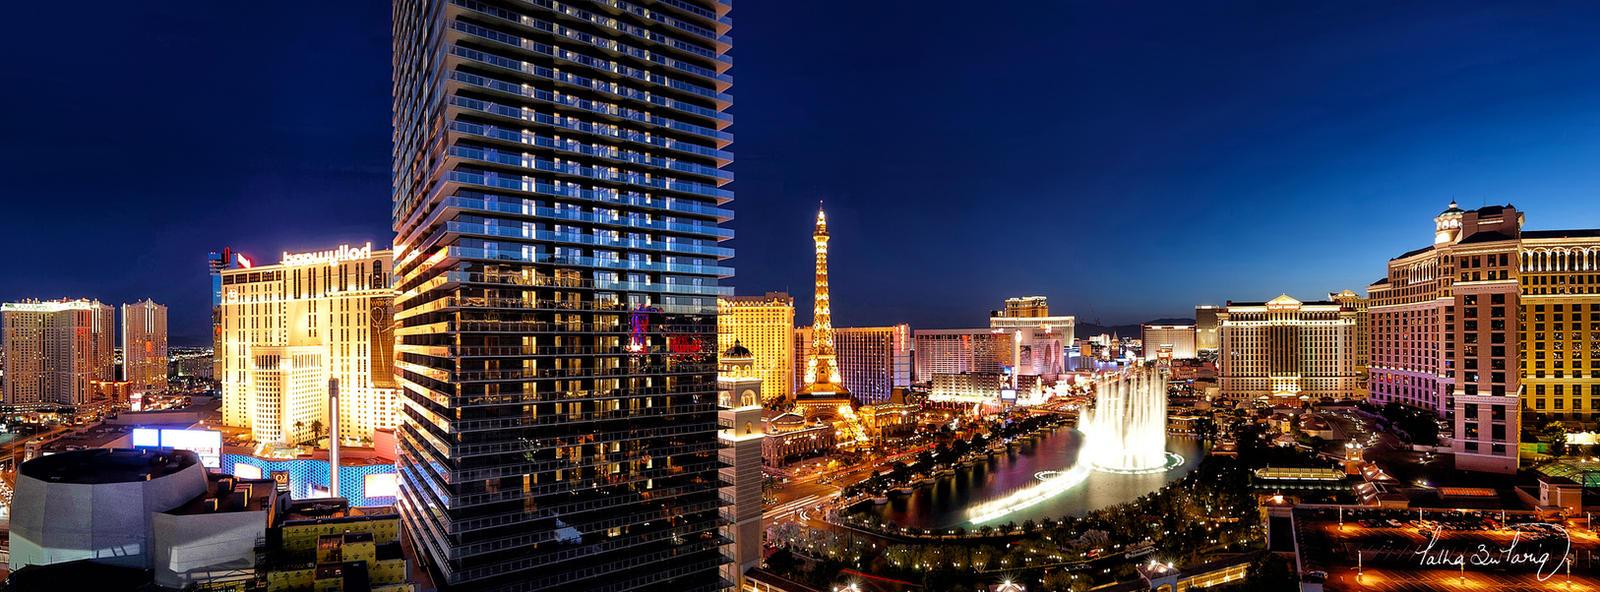 Las Vegas Strip by ~tt83x